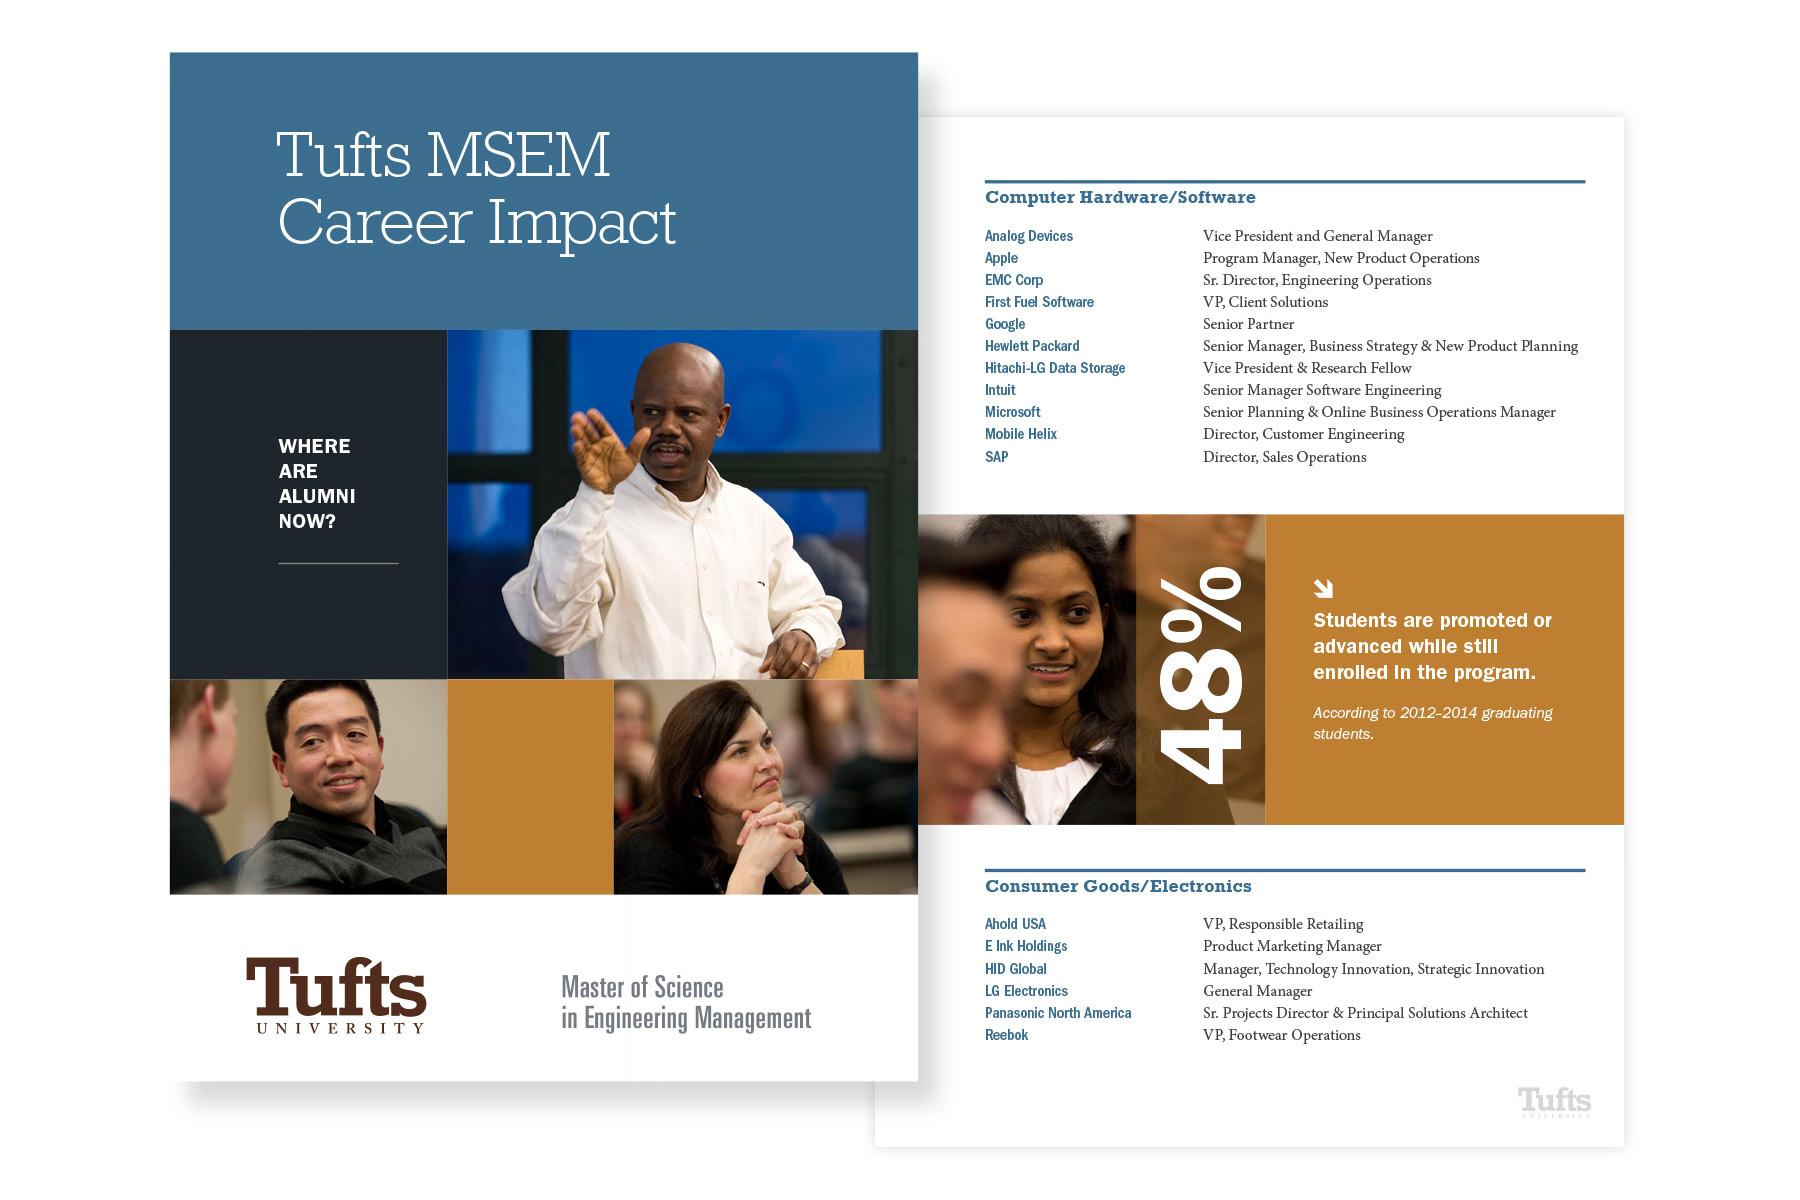 Tufts University Tufts Career Impact brochure spread